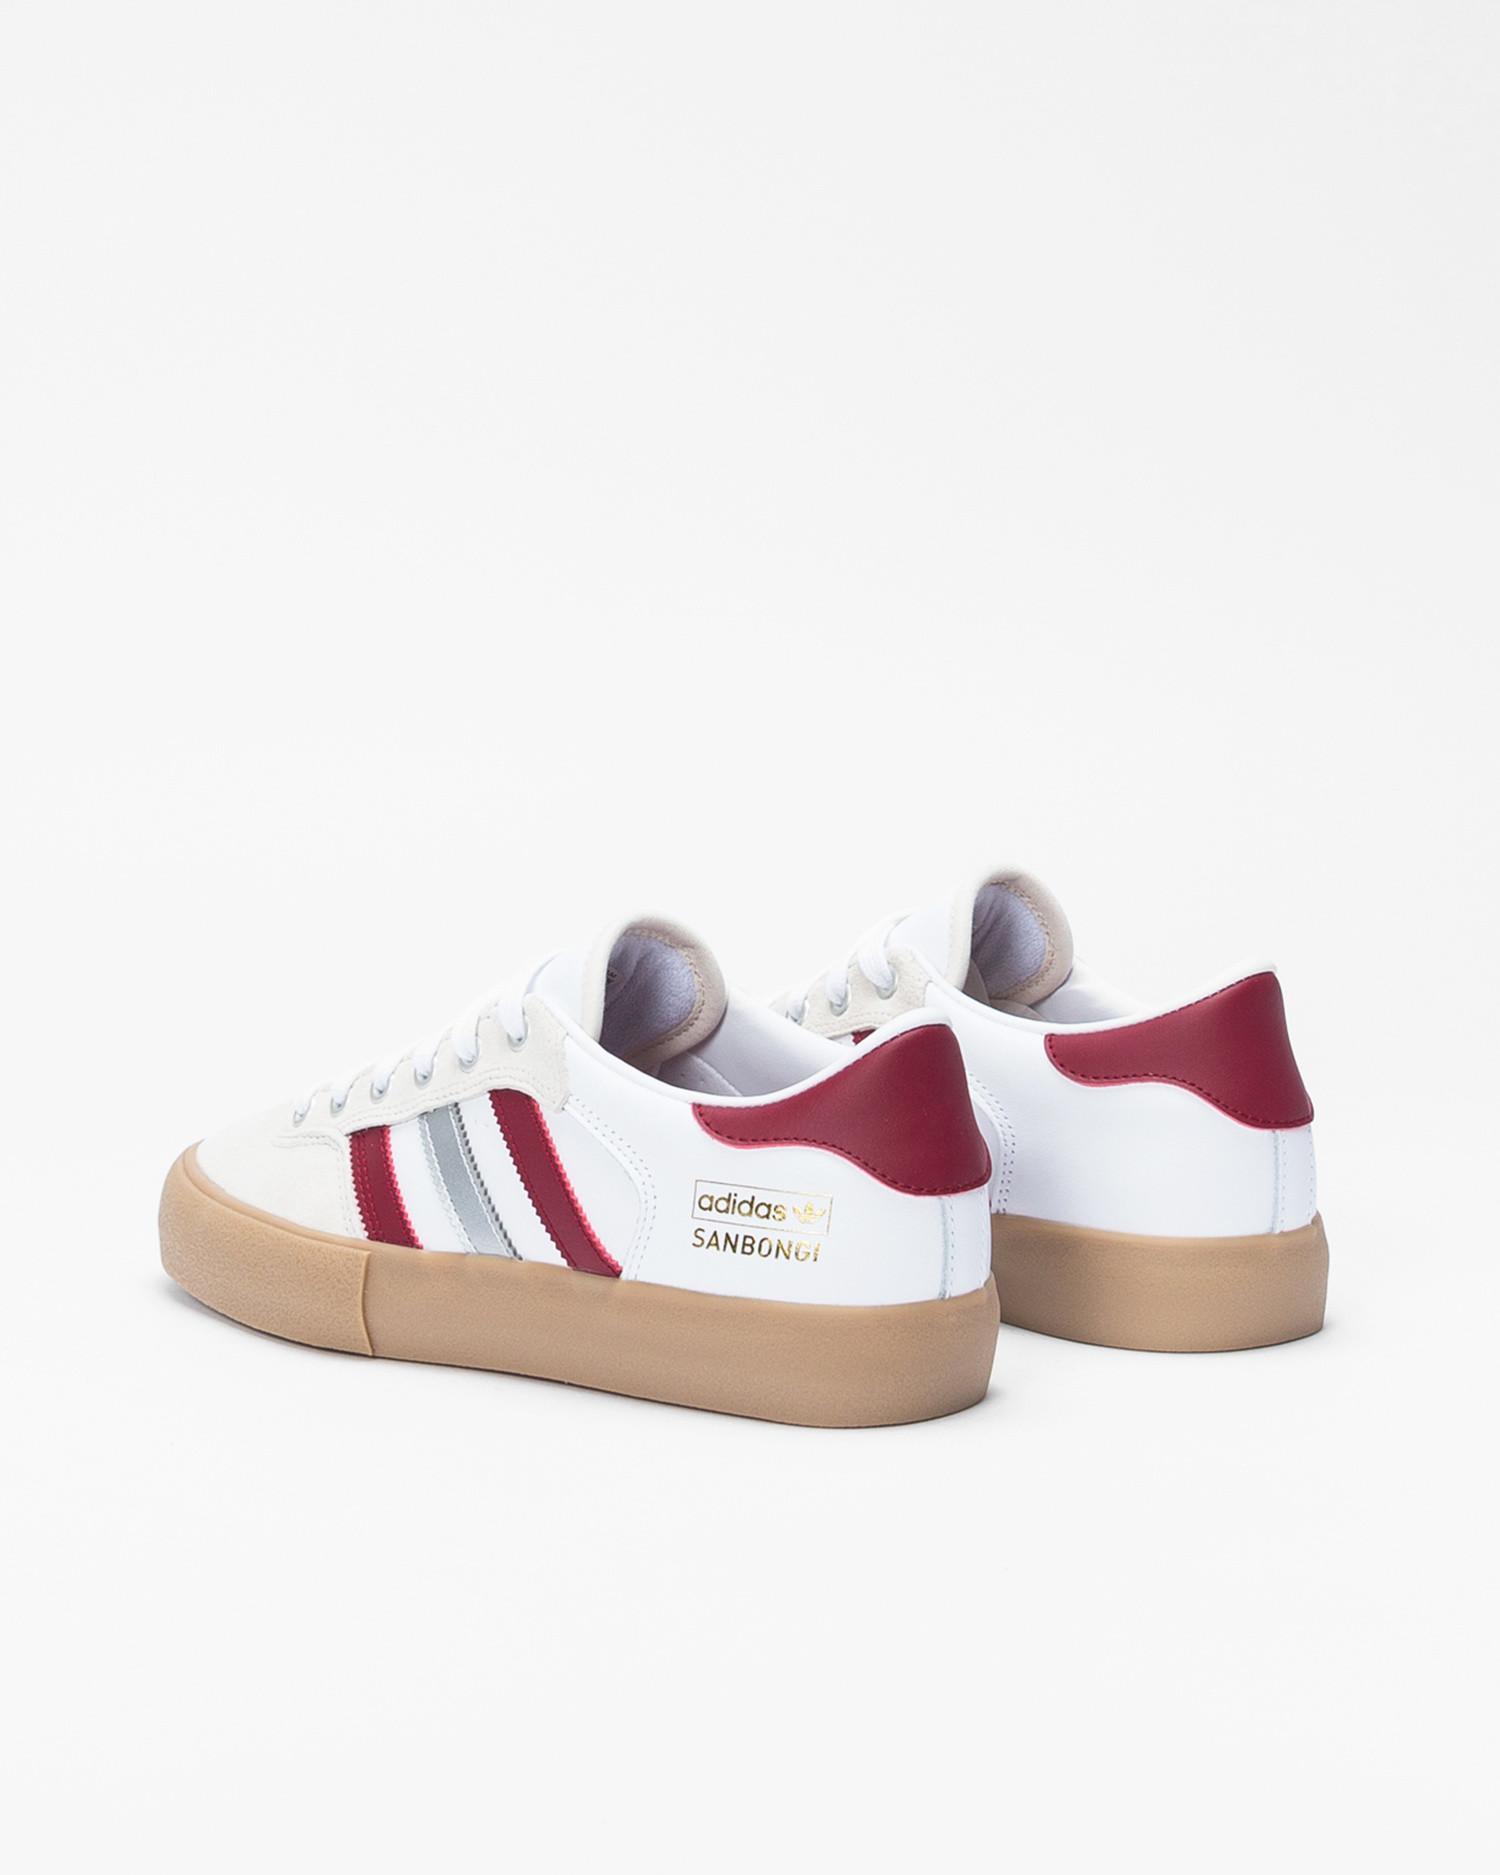 Adidas Matchbreak Super Shin Sanbongi Ftwht/Cburgu/Gum4